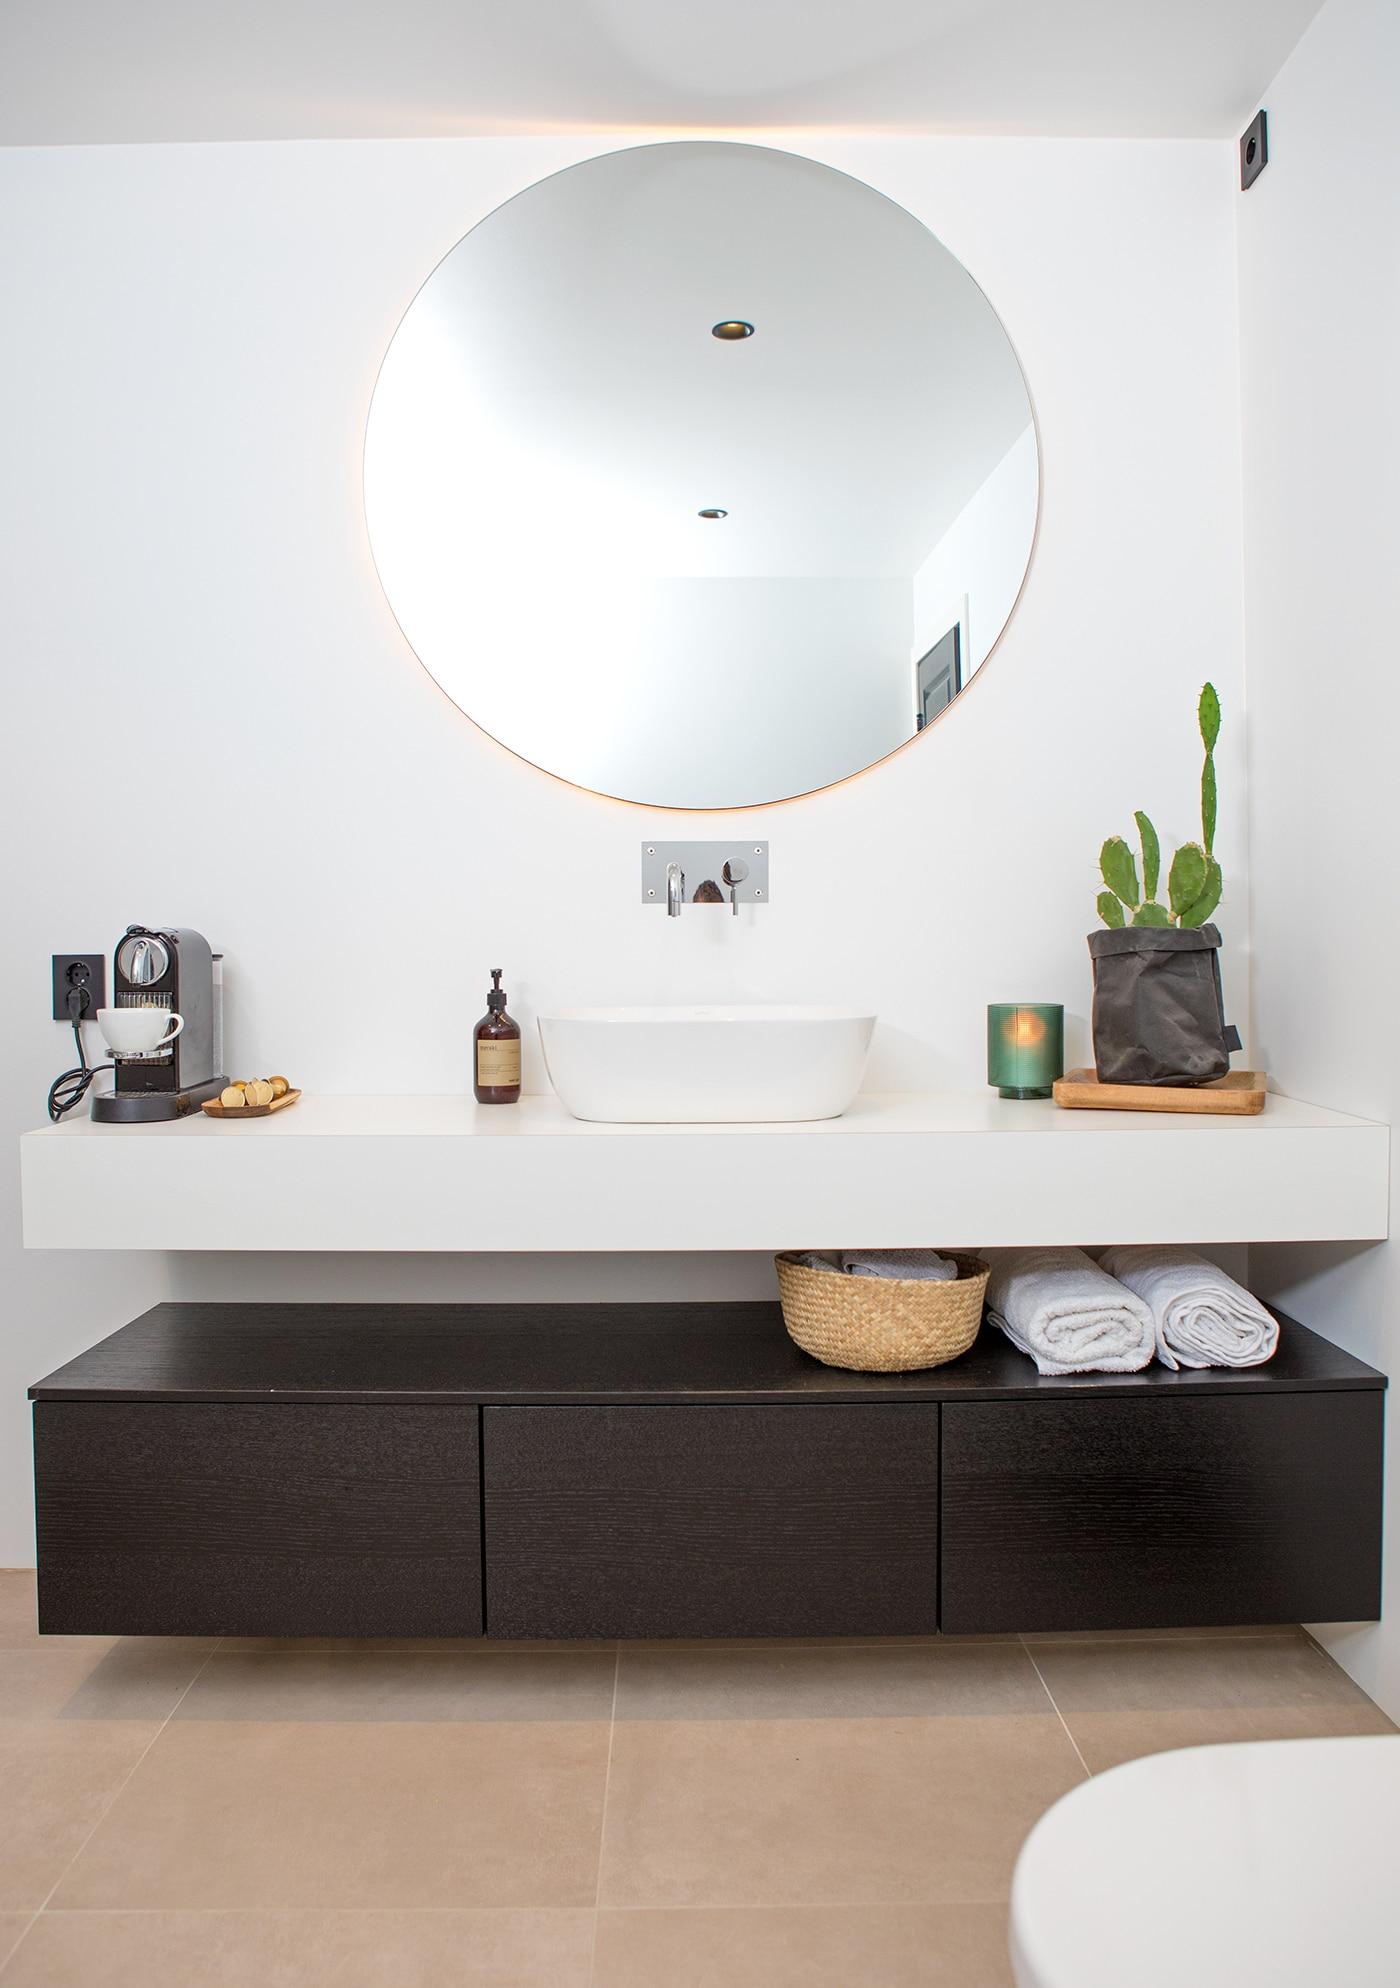 Rundt speil på nytt bad